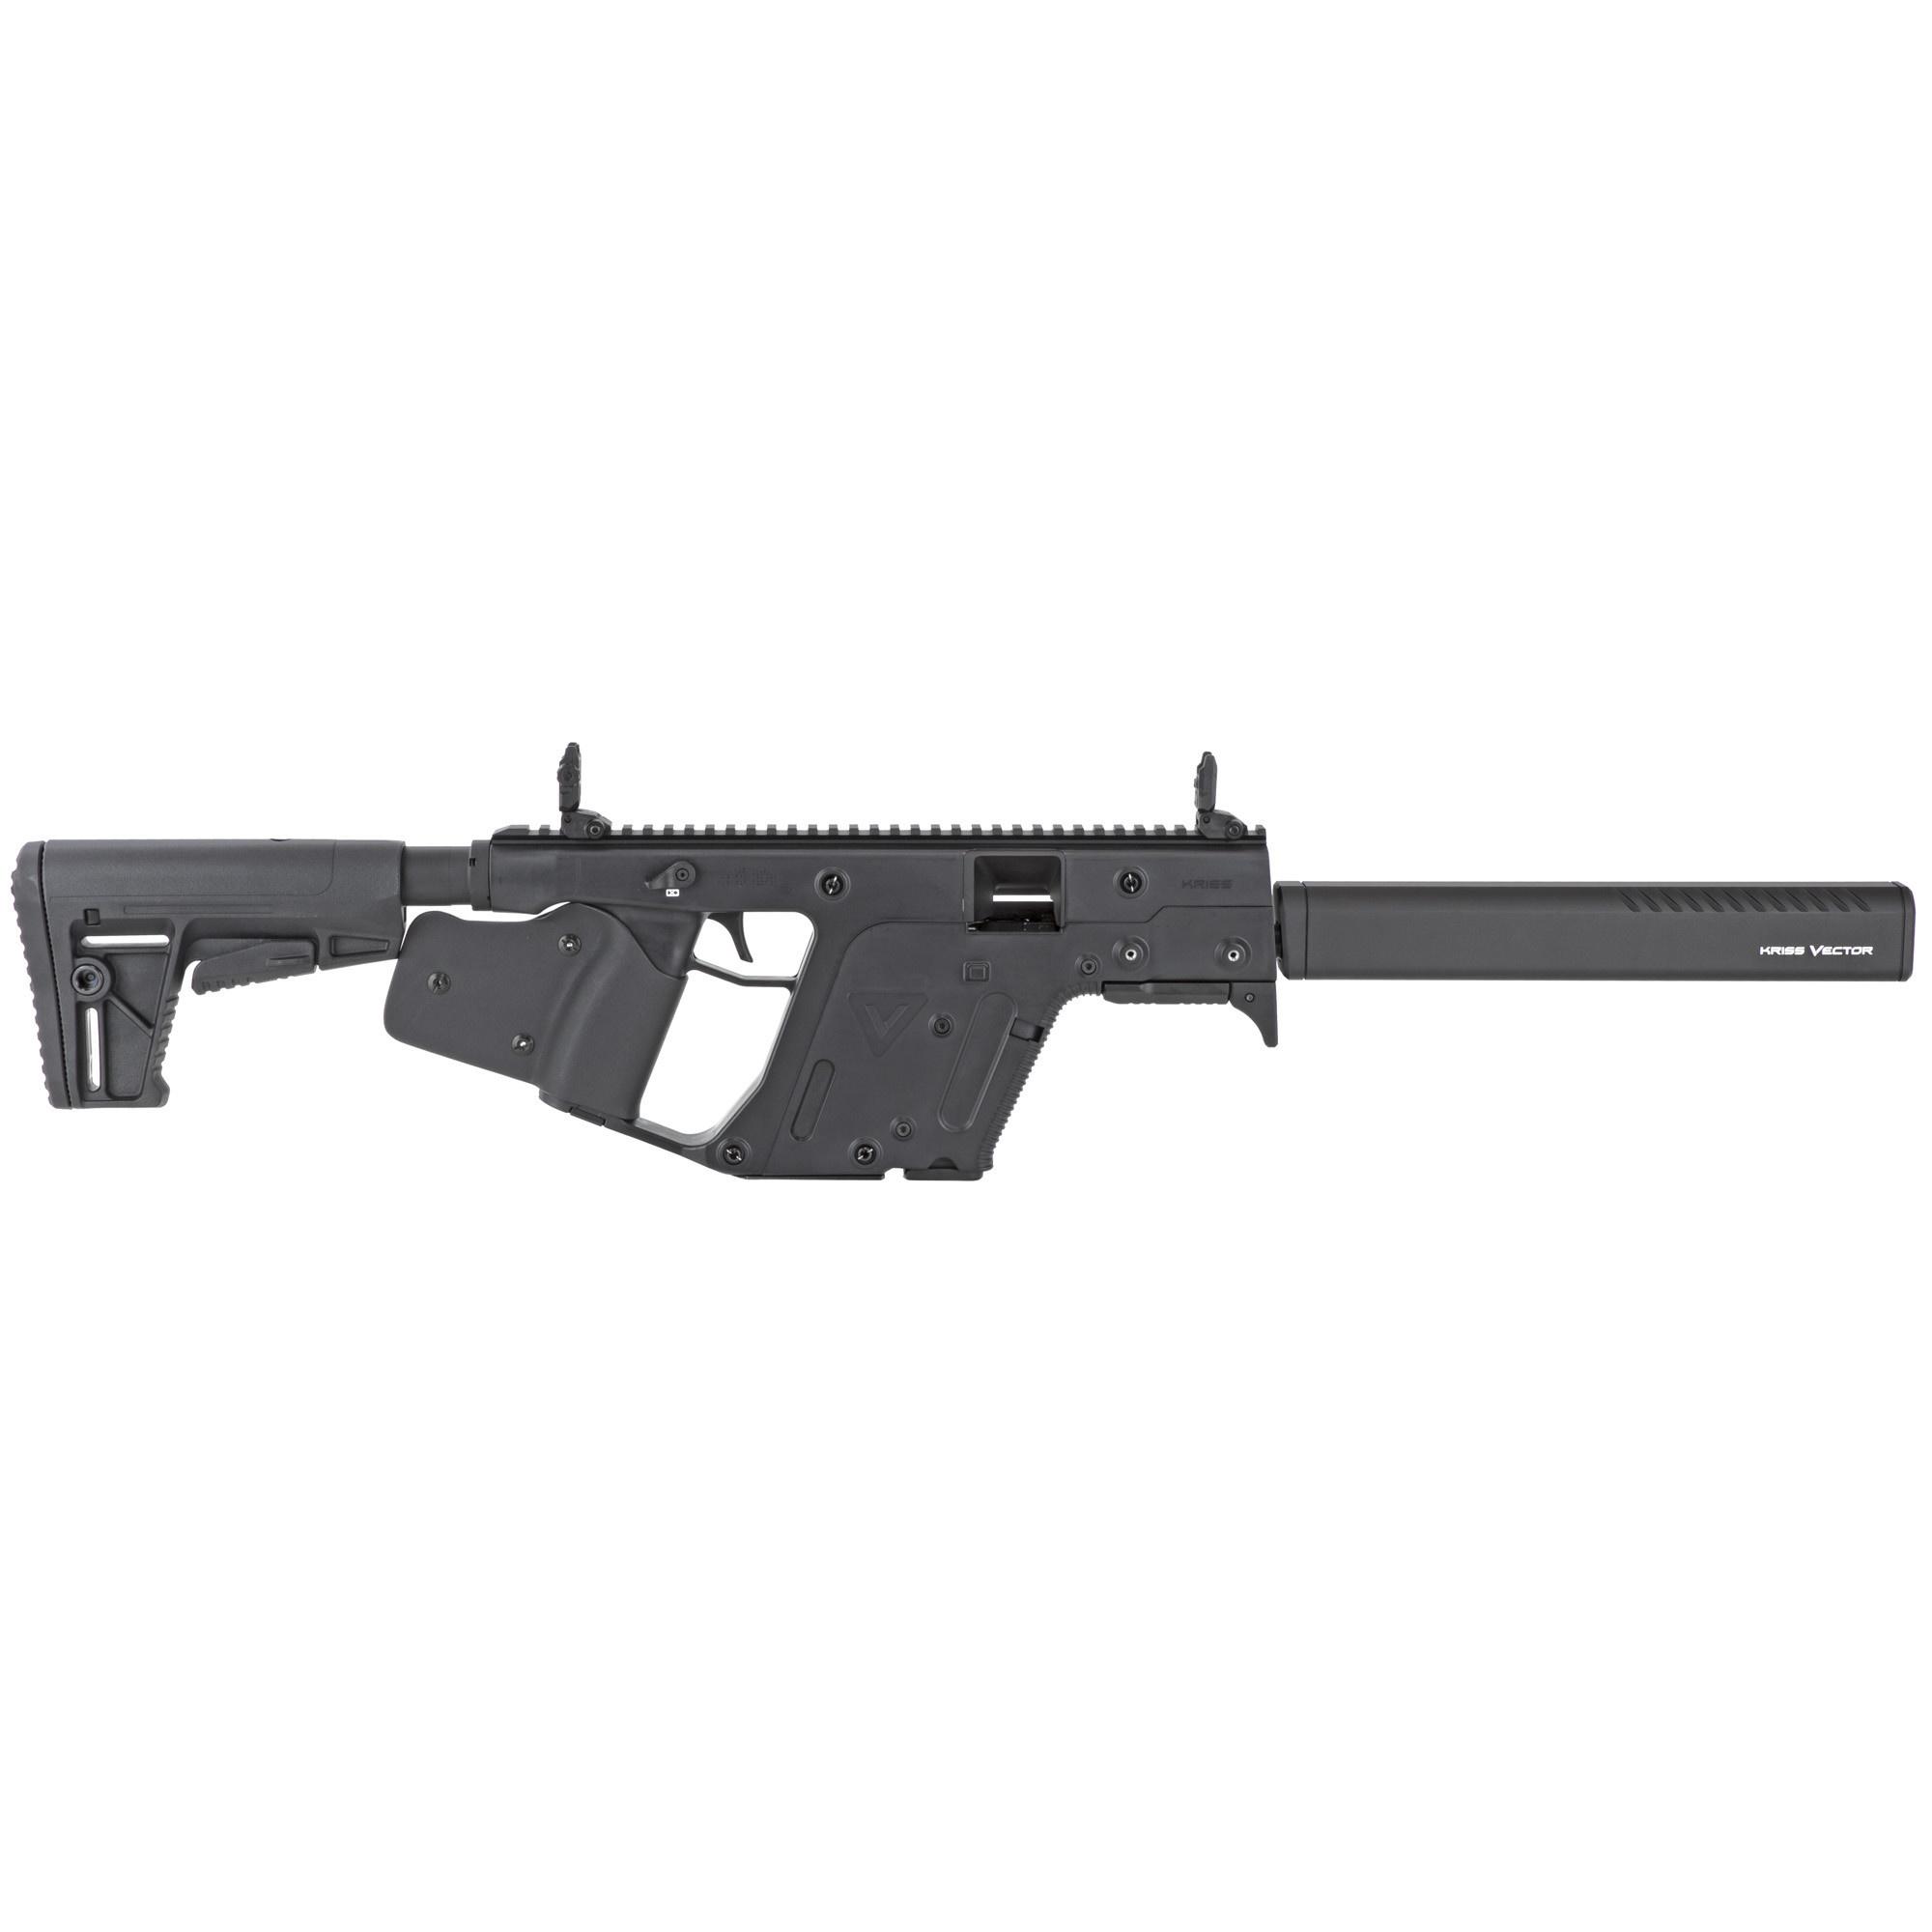 Kriss USA, Inc. Vector CRB Rifle 9MM